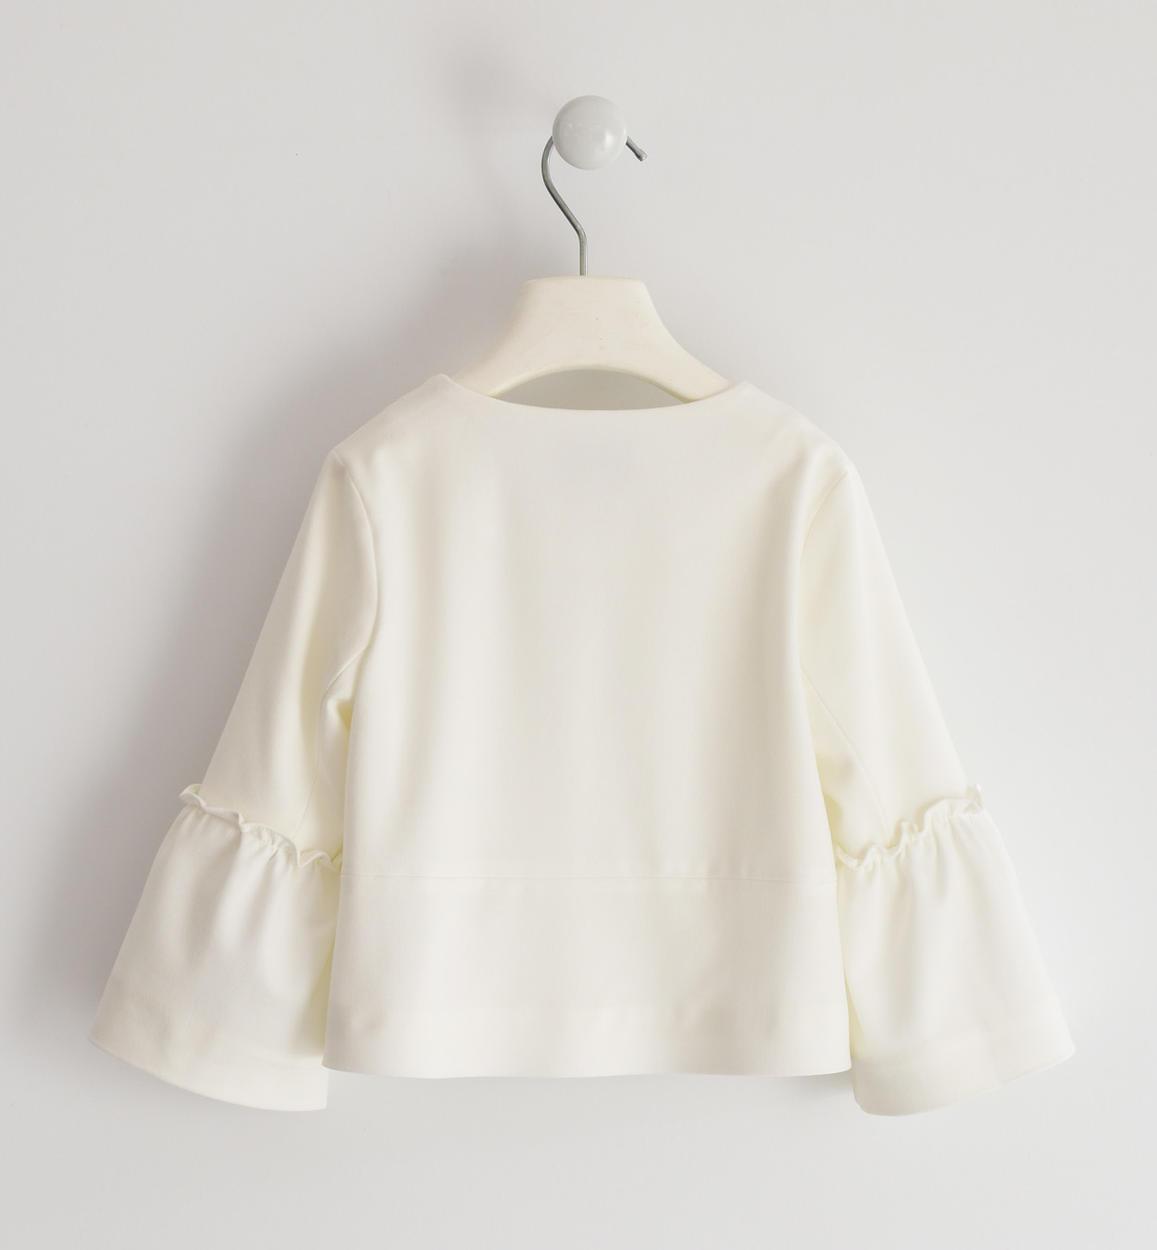 giacchina elegante in misto viscosa stre panna dettaglio 03 2784j55100 0112 150x150